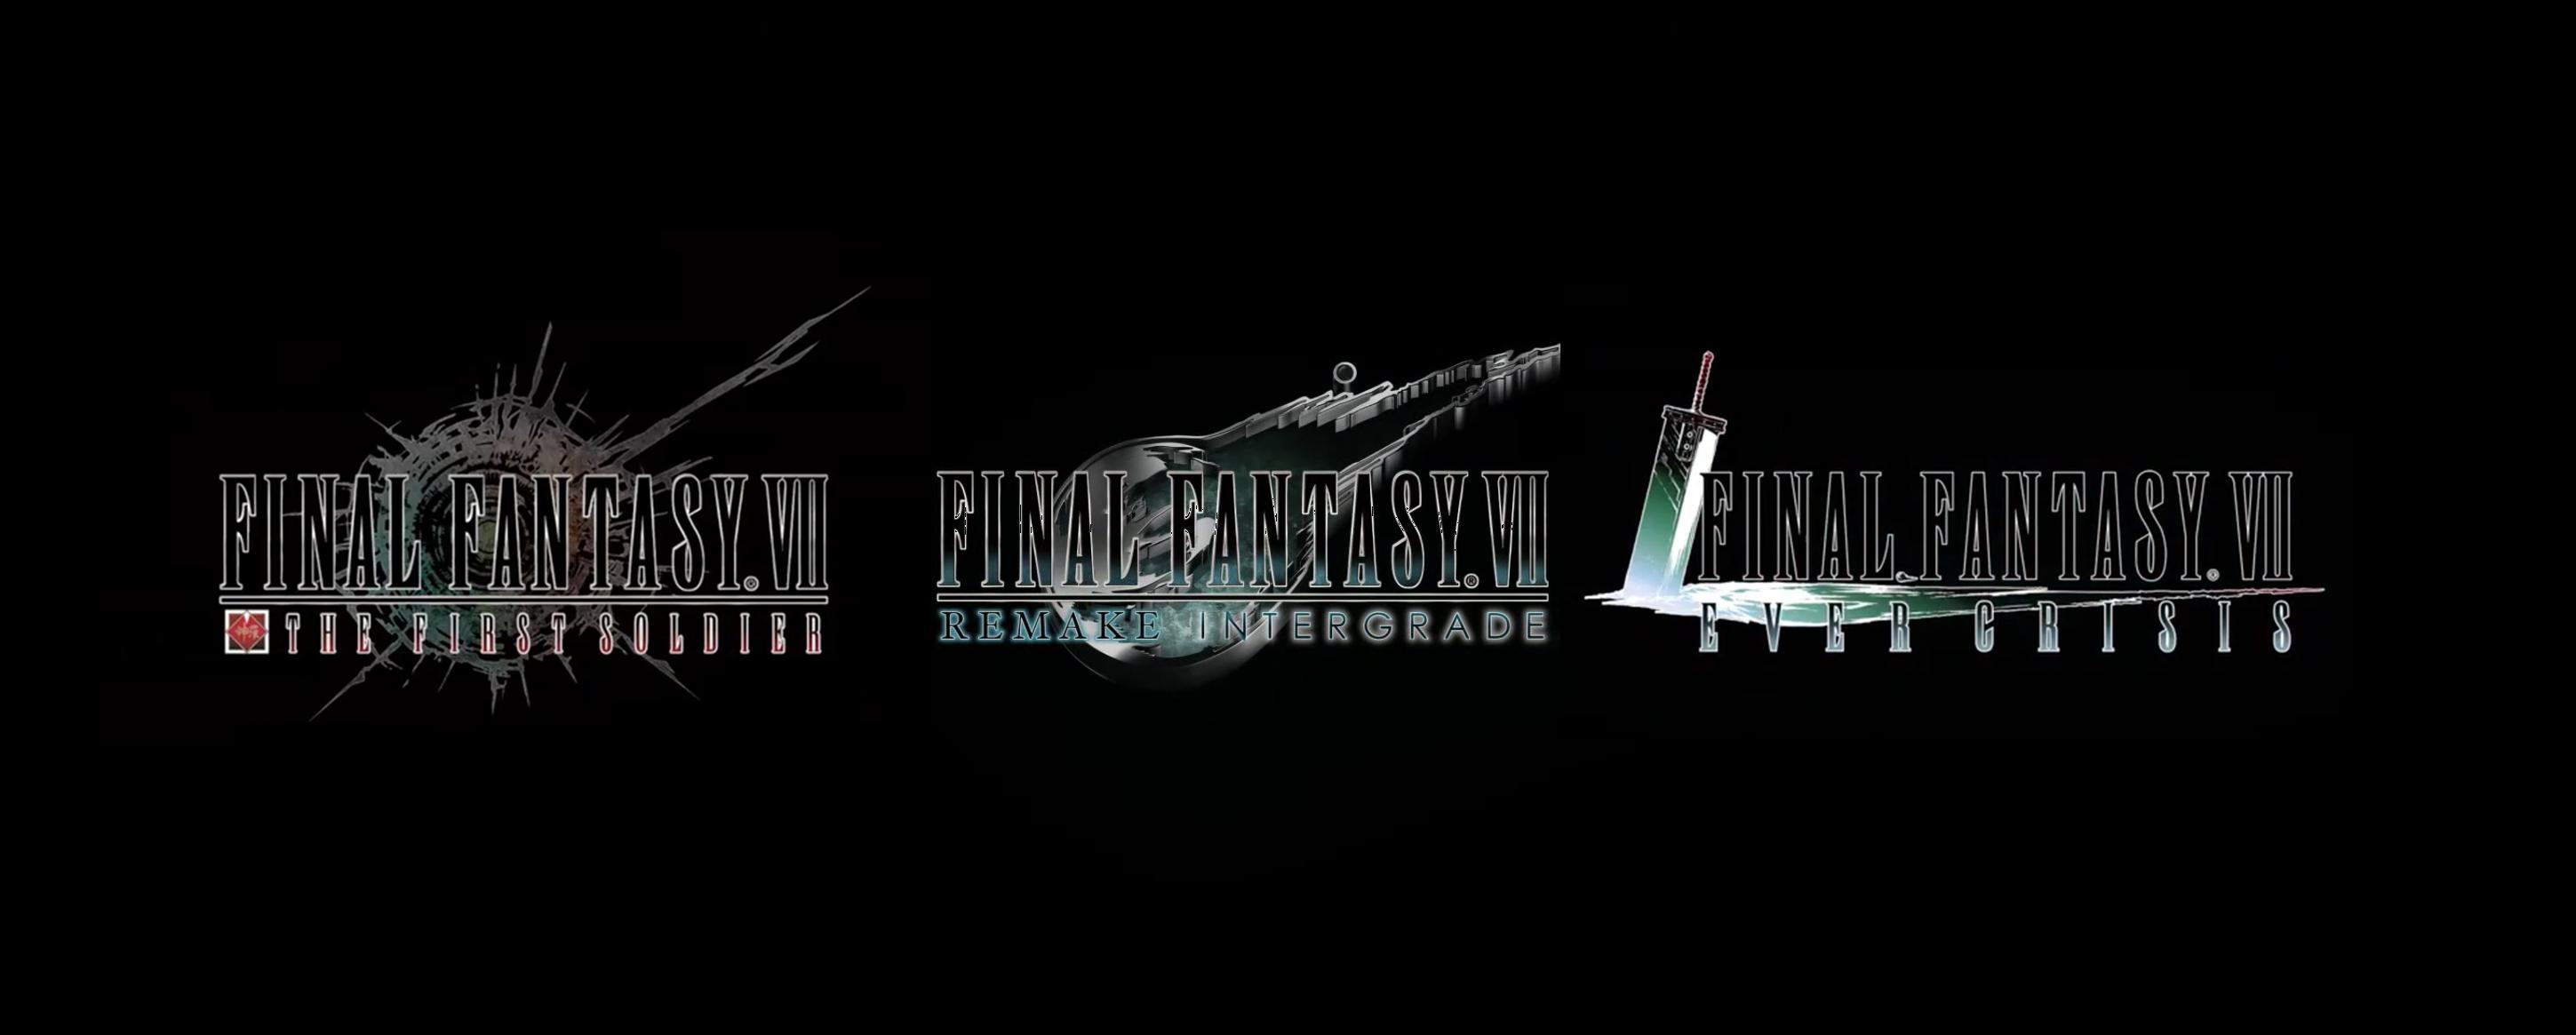 Final Fantasy 7 Remake Intergrade March 2021 Interview with Nomura Translation